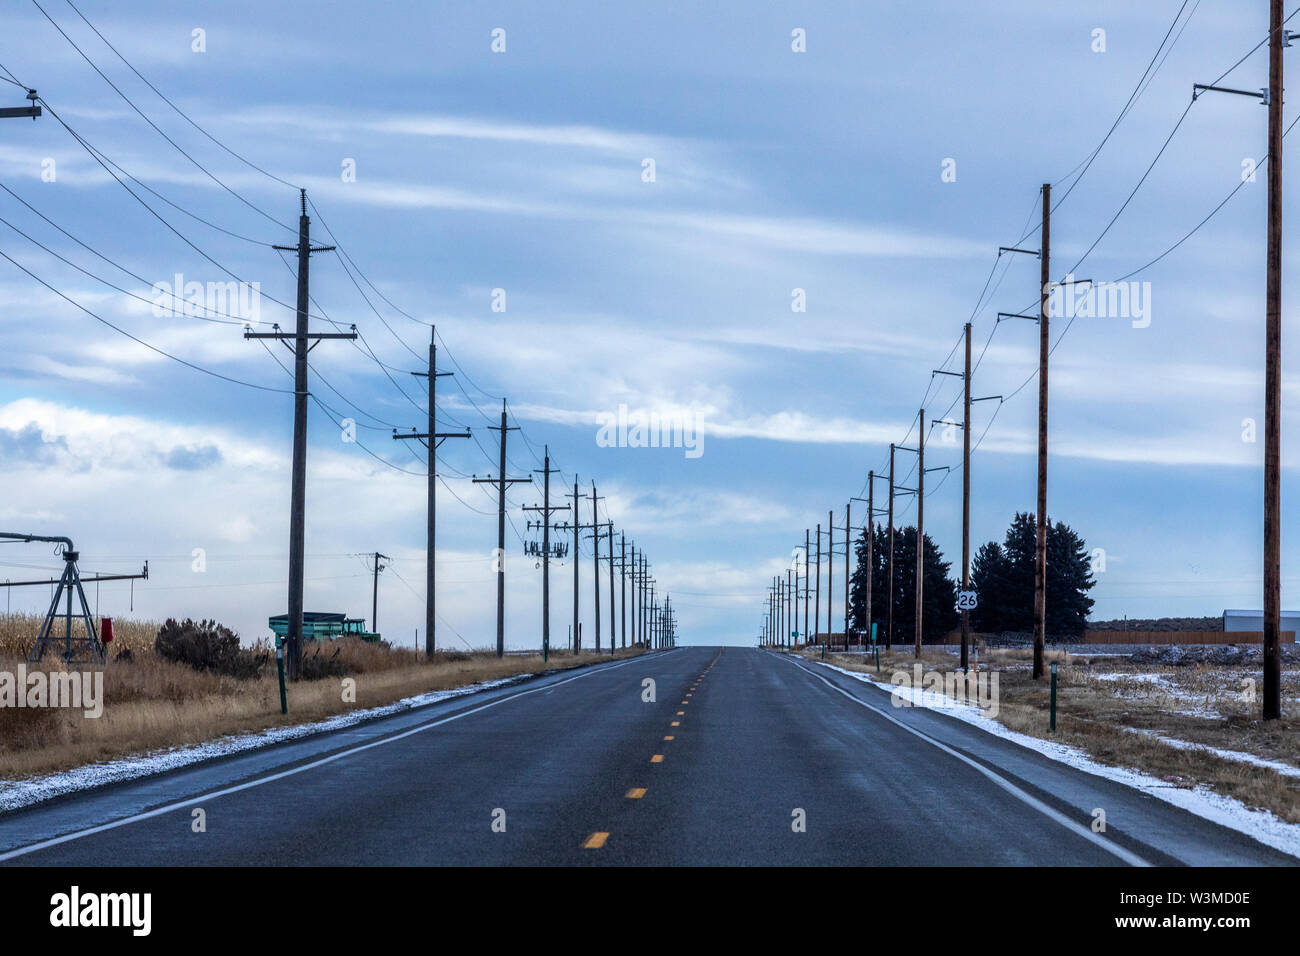 Highway in Gooding, Idaho - Stock Image